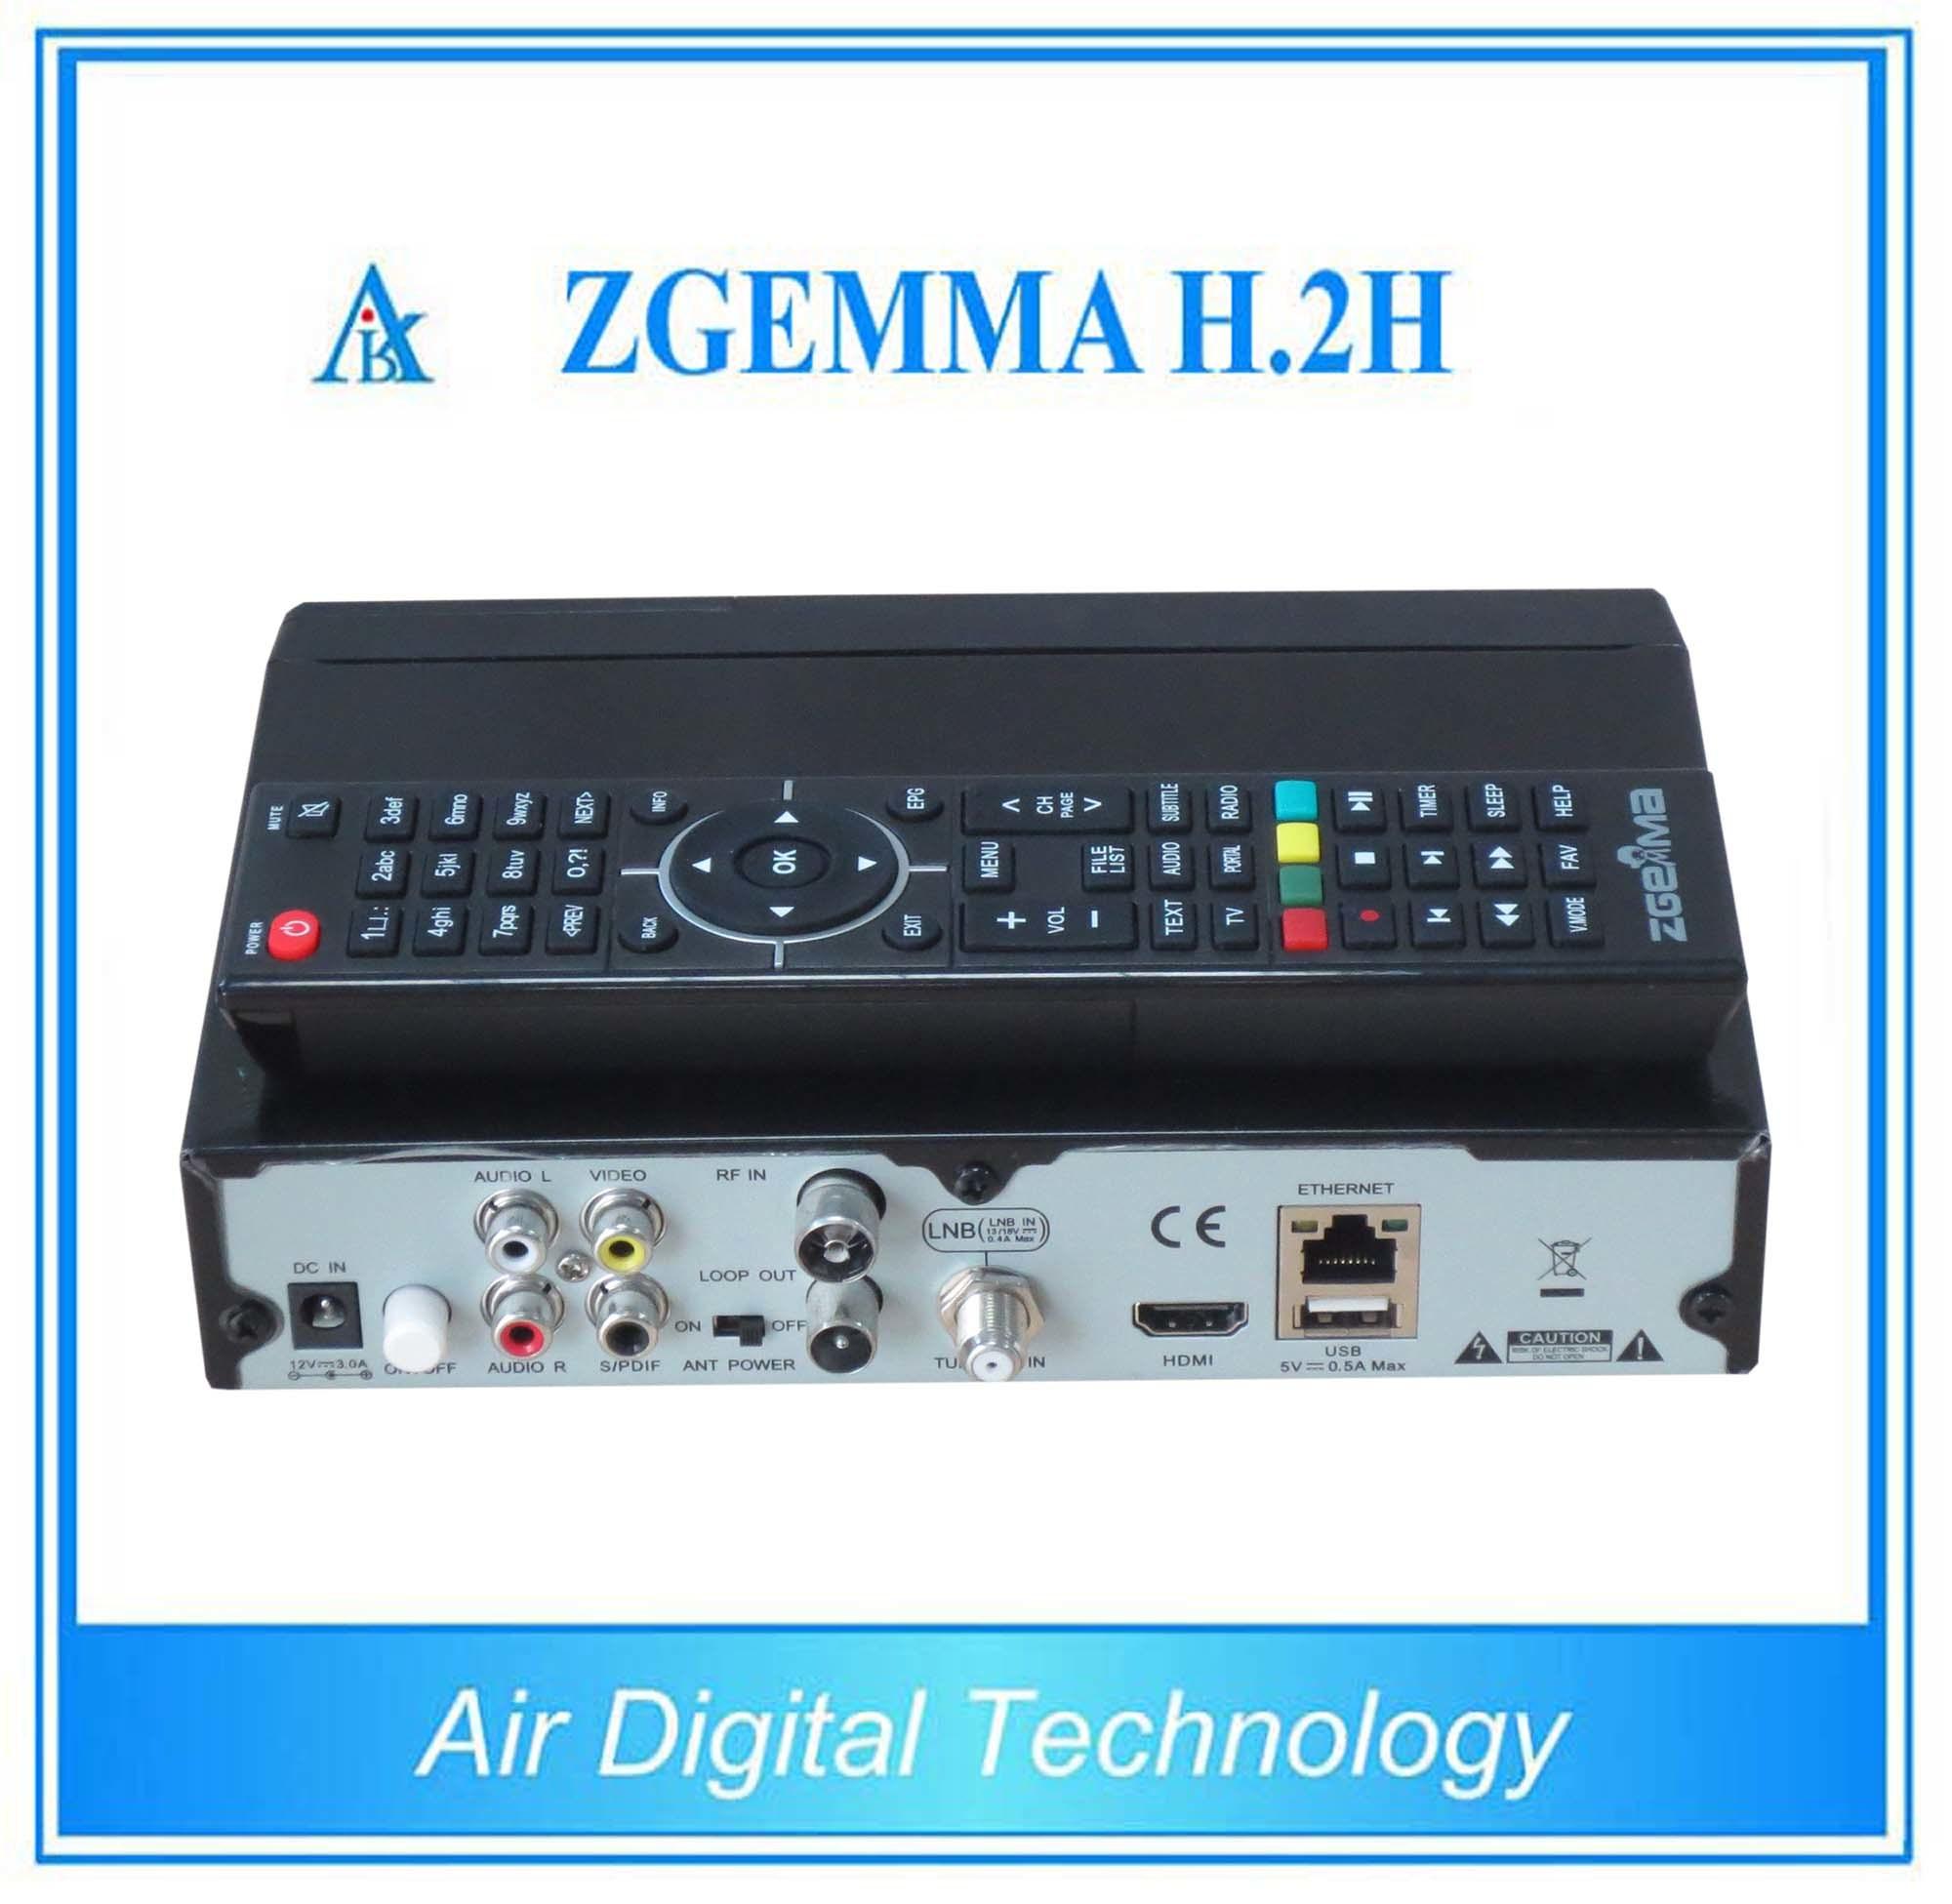 Digital Satellite Receiver DVB S2 + DVB T2 Satellite & Terrestrial Receiver with Dual Core CPU Zgemma H. 2h